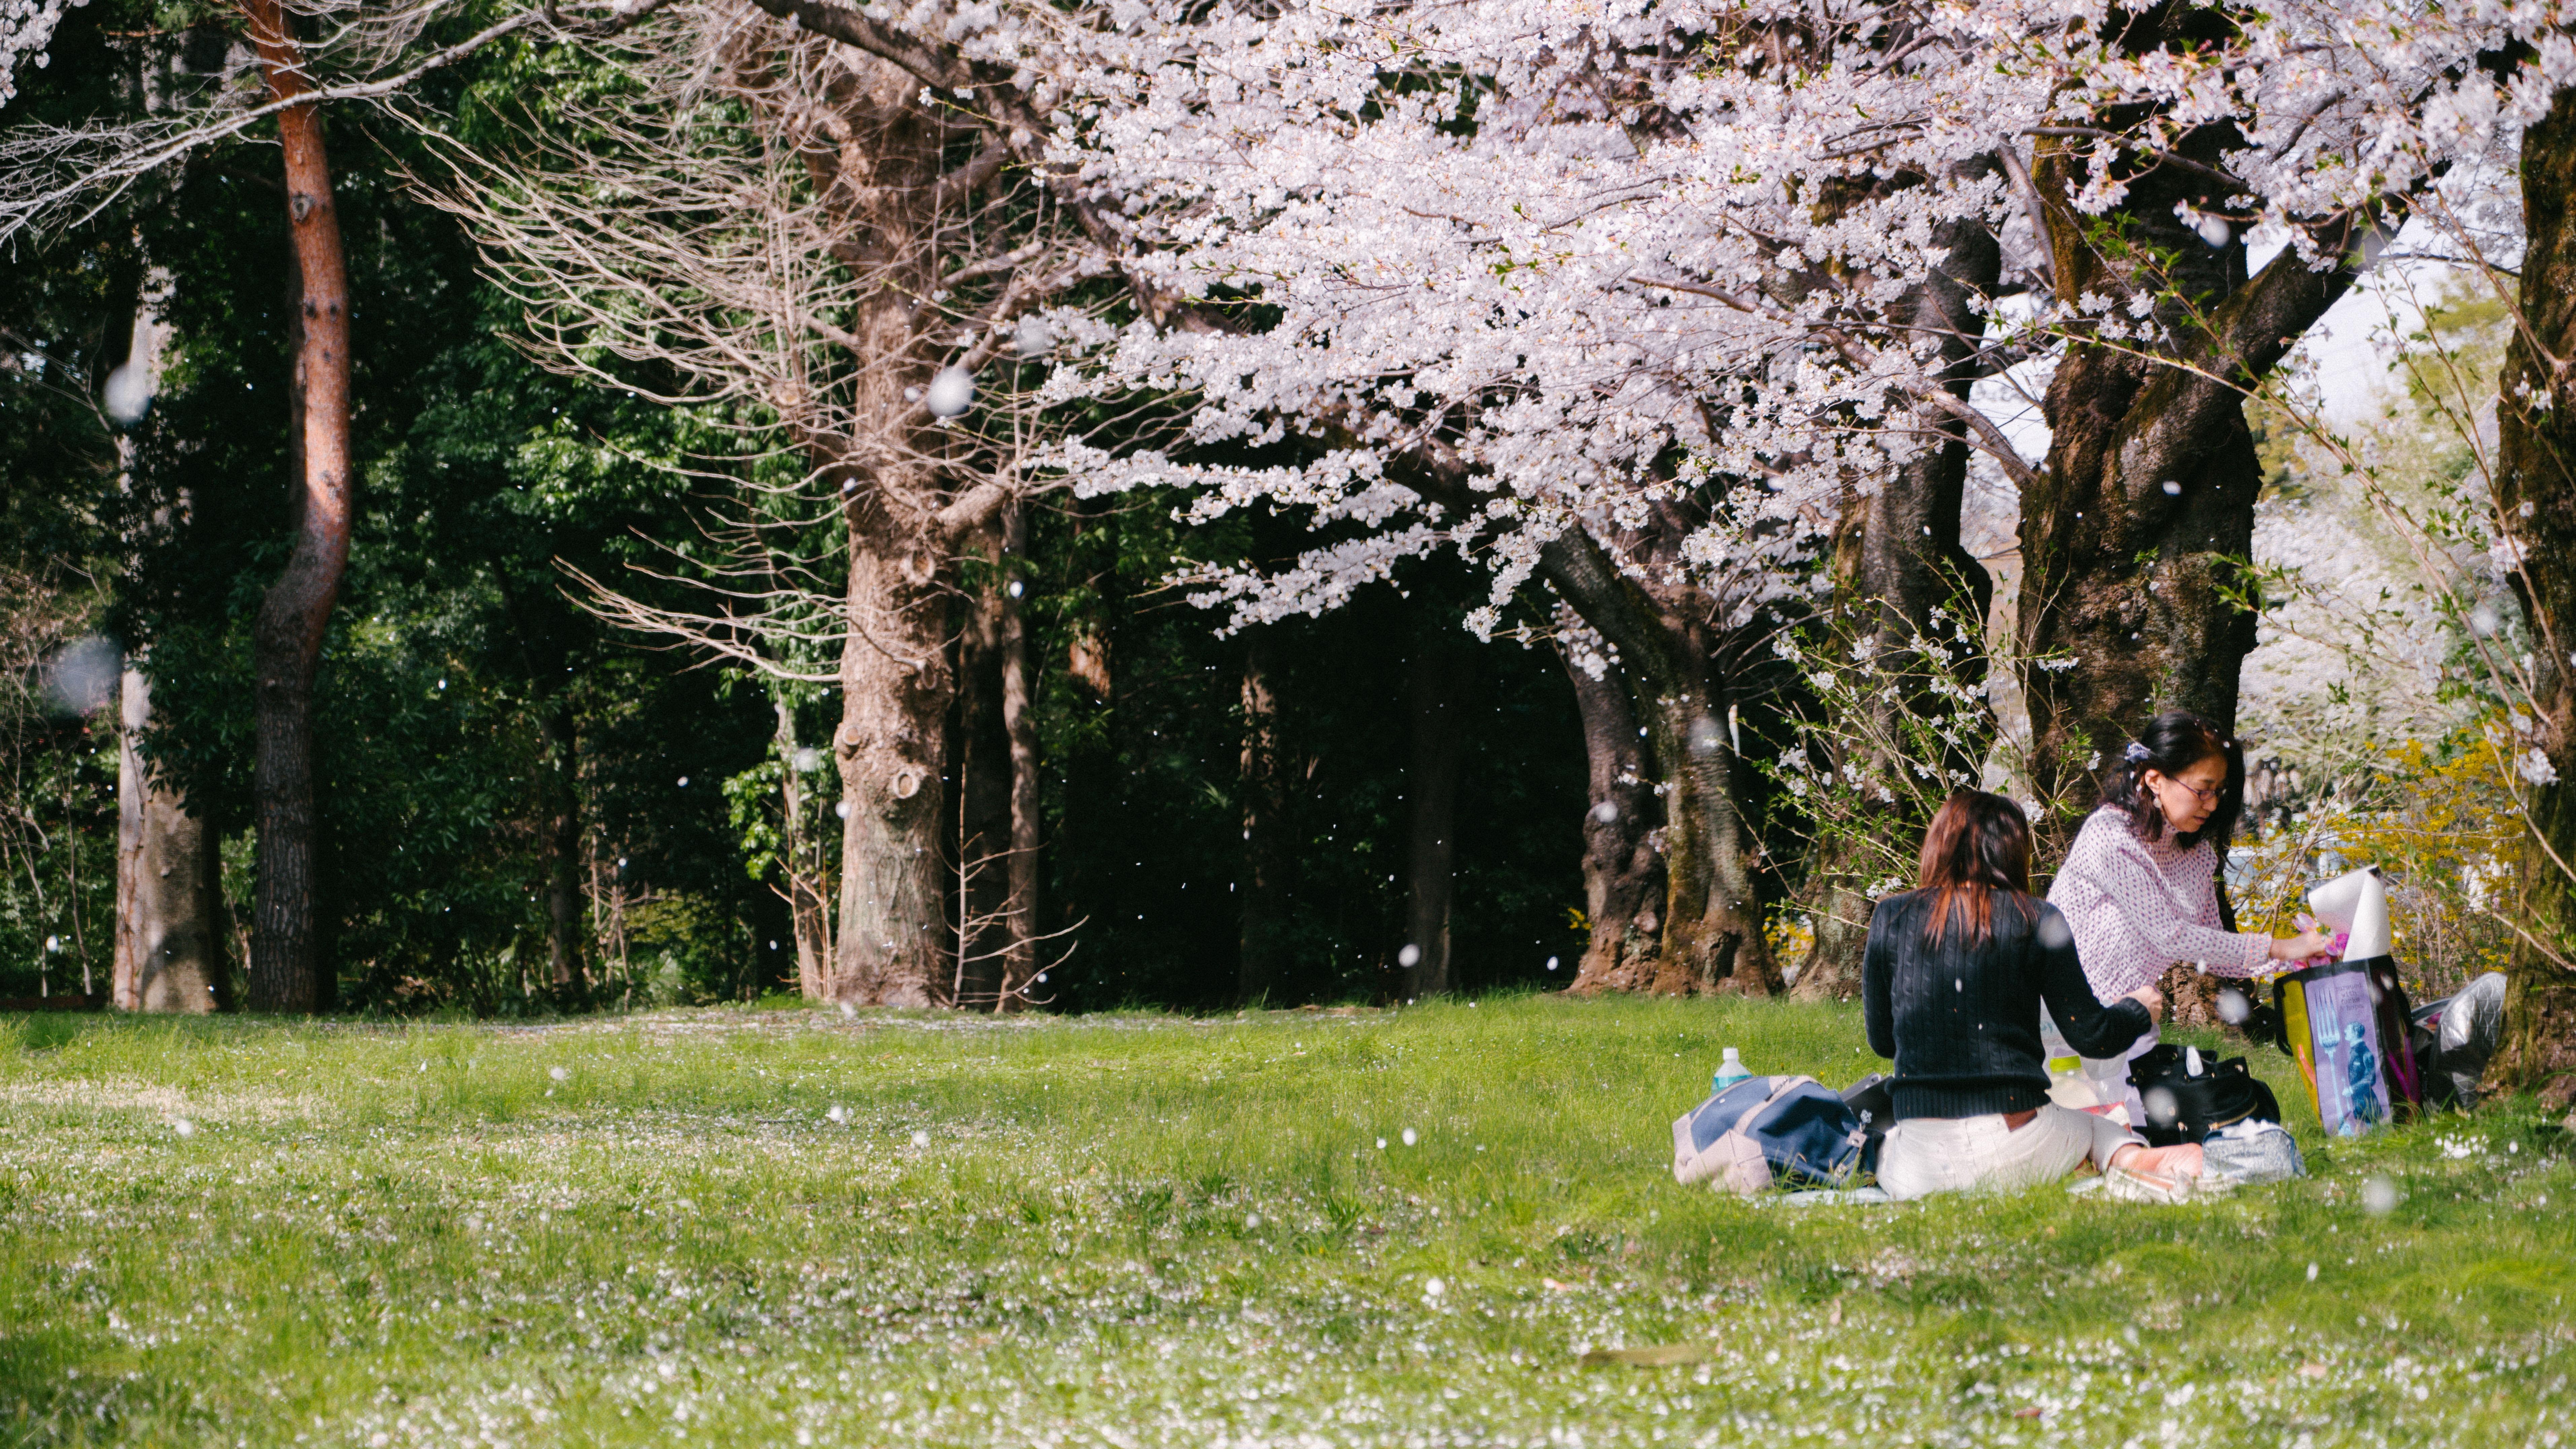 two women sitting under cherry blossom tree